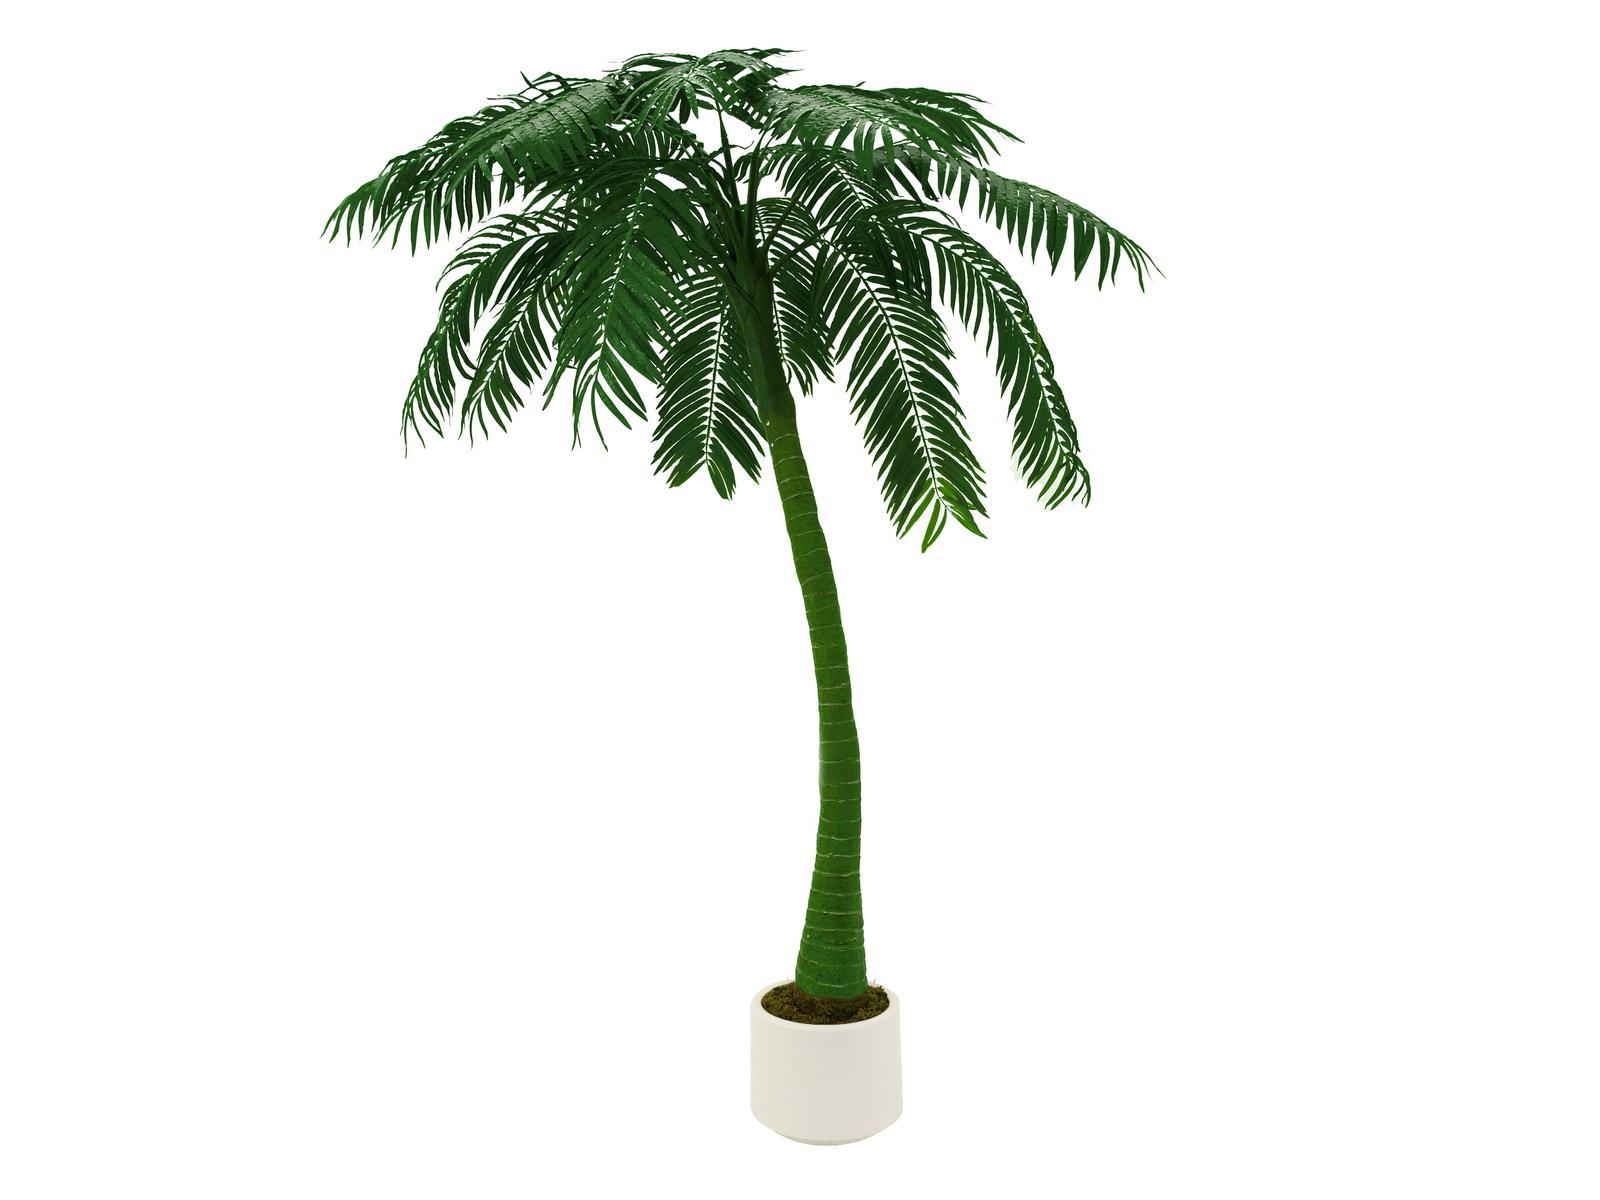 Kunstig Palm, 1-trunk, 300cm - Grøn